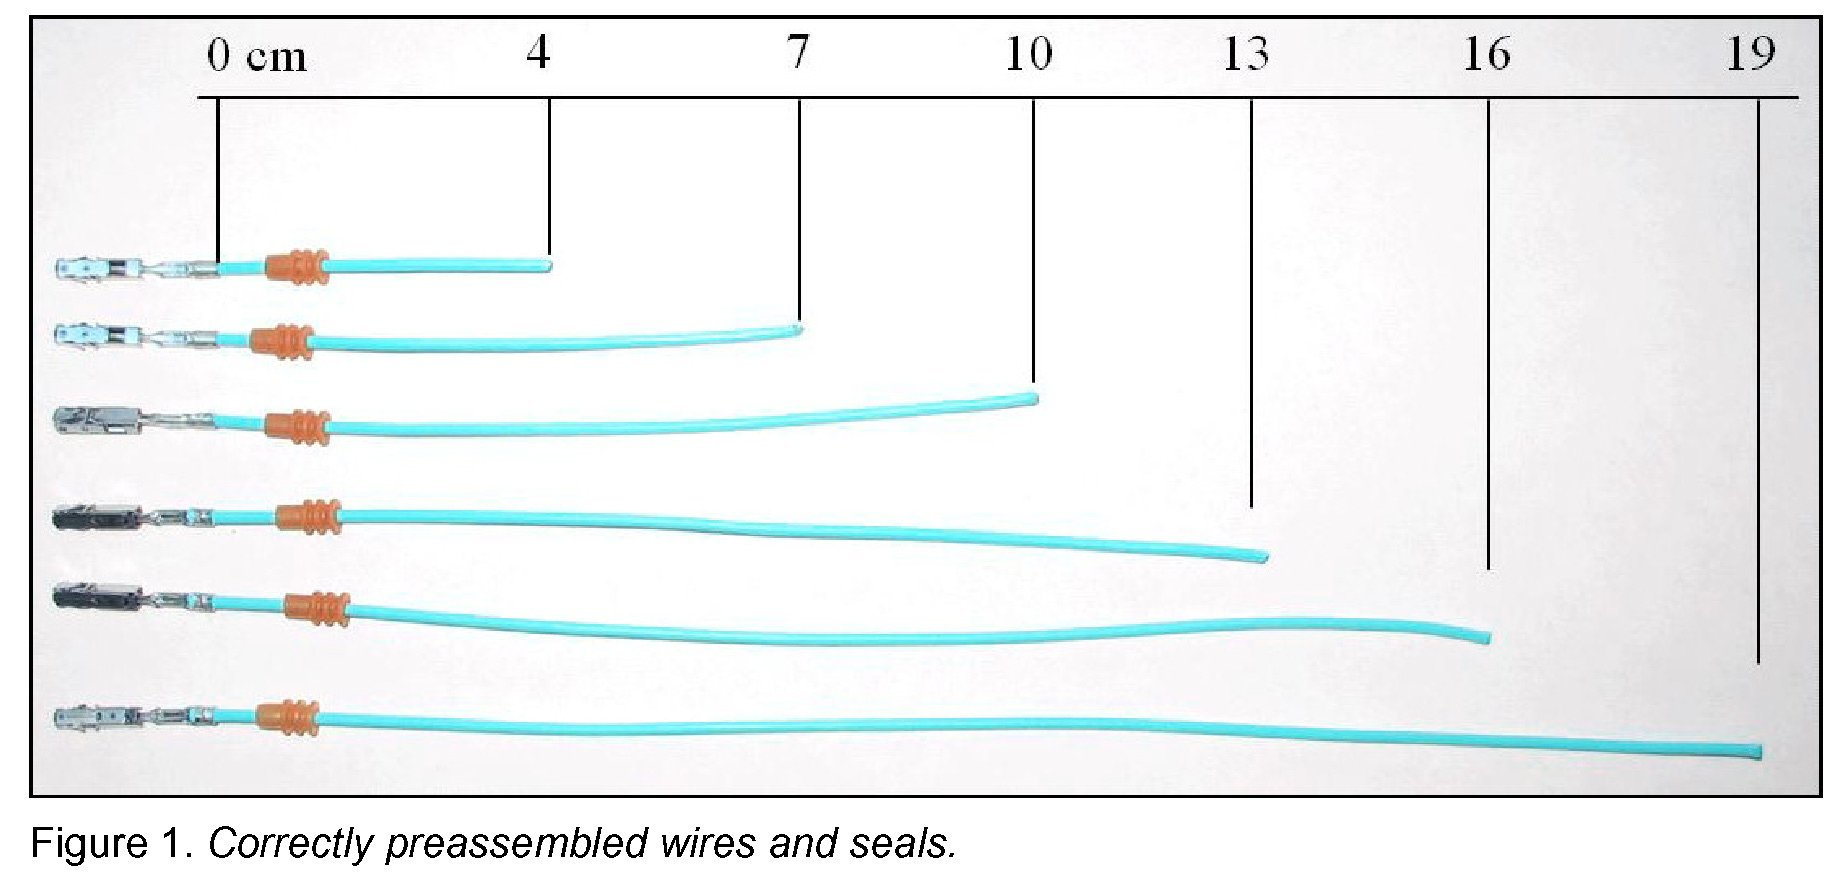 Epc Novyc Leds Wiring Diagram Auto Electrical Volvo P1800 Fuse Box Strut